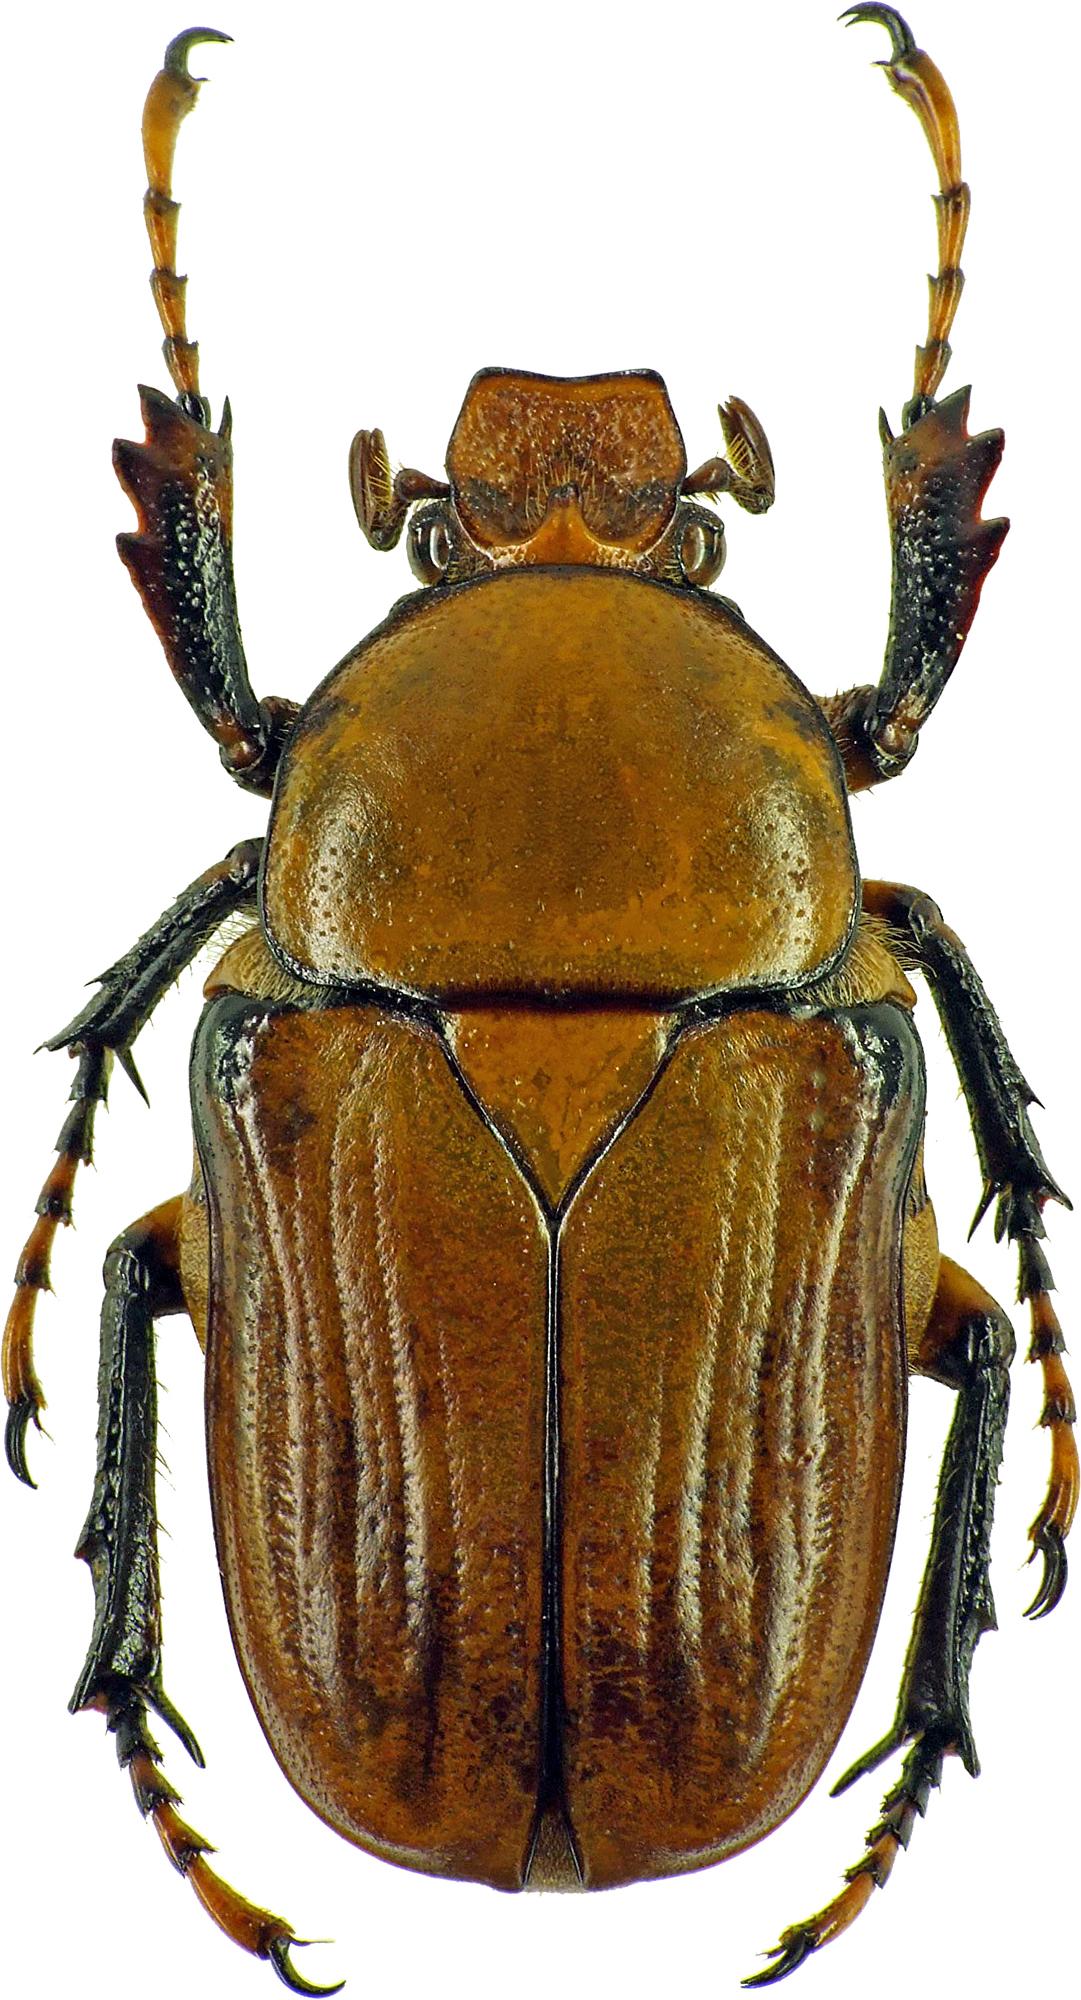 Platynocephalus miyashitai 7273cz78.jpg